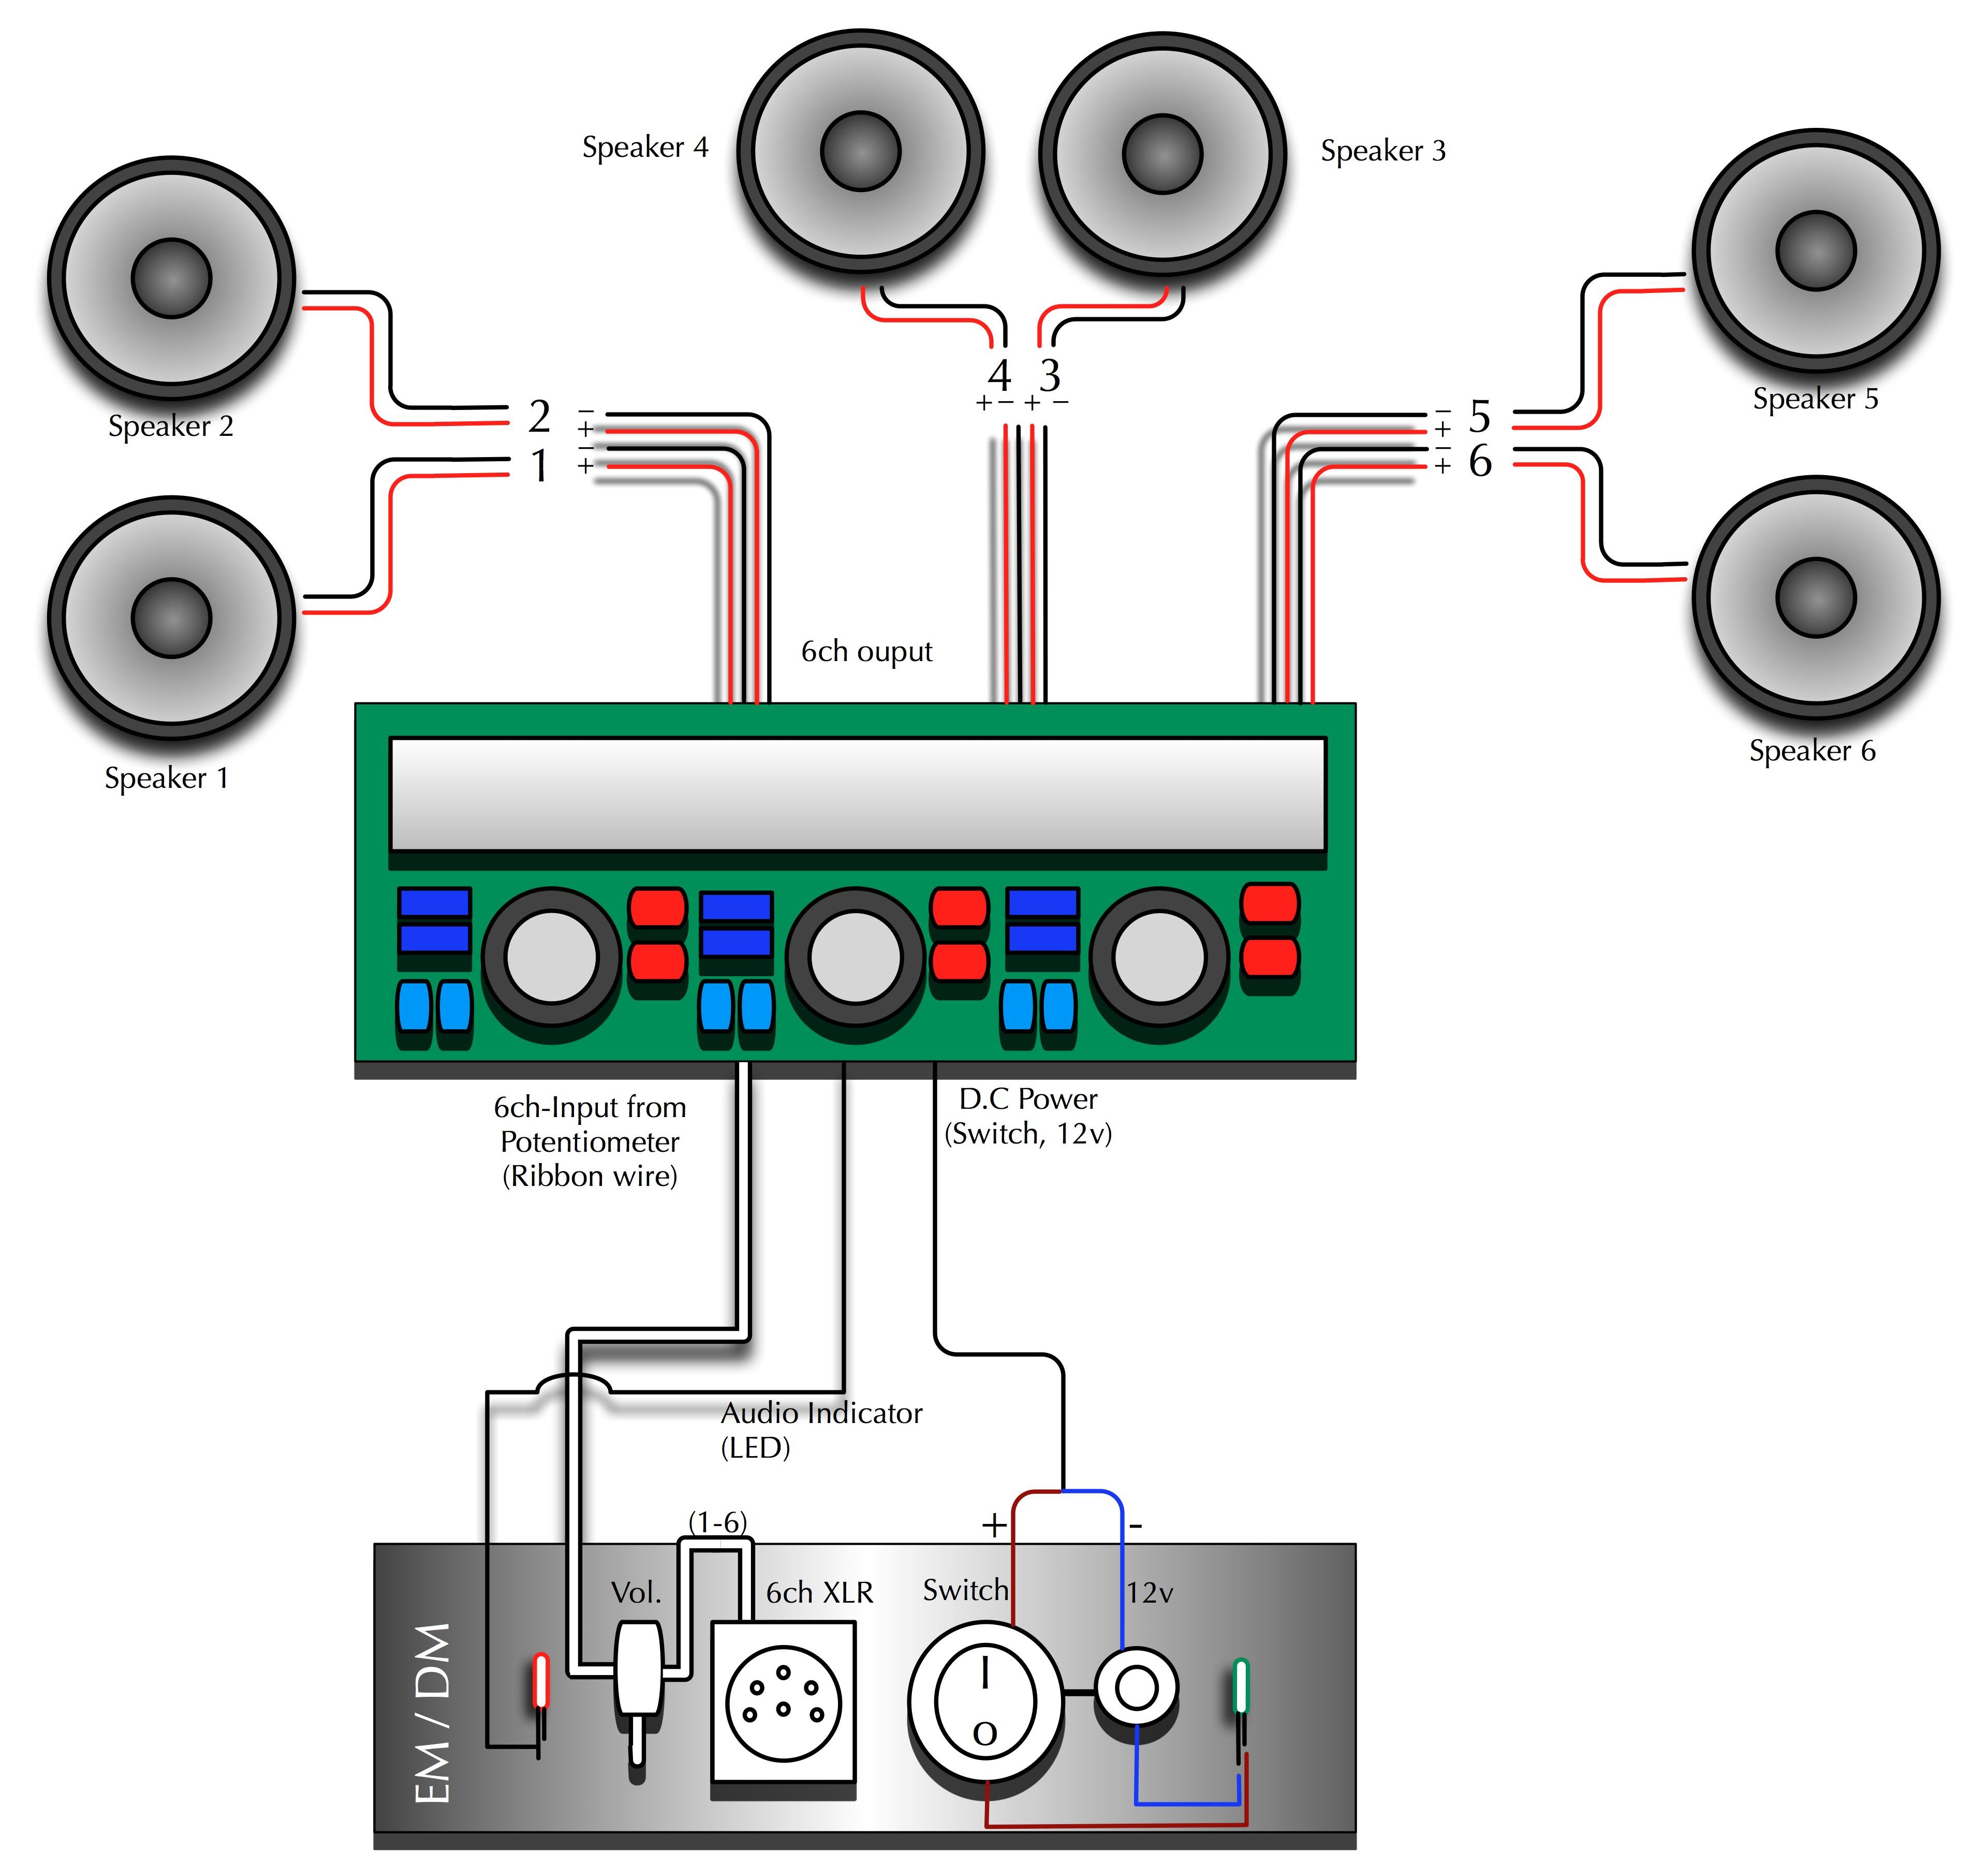 6 channel amp wiring diagram wiring diagram services u2022 rh openairpublishing com Alpine Power Amps Alpine Flex Amps